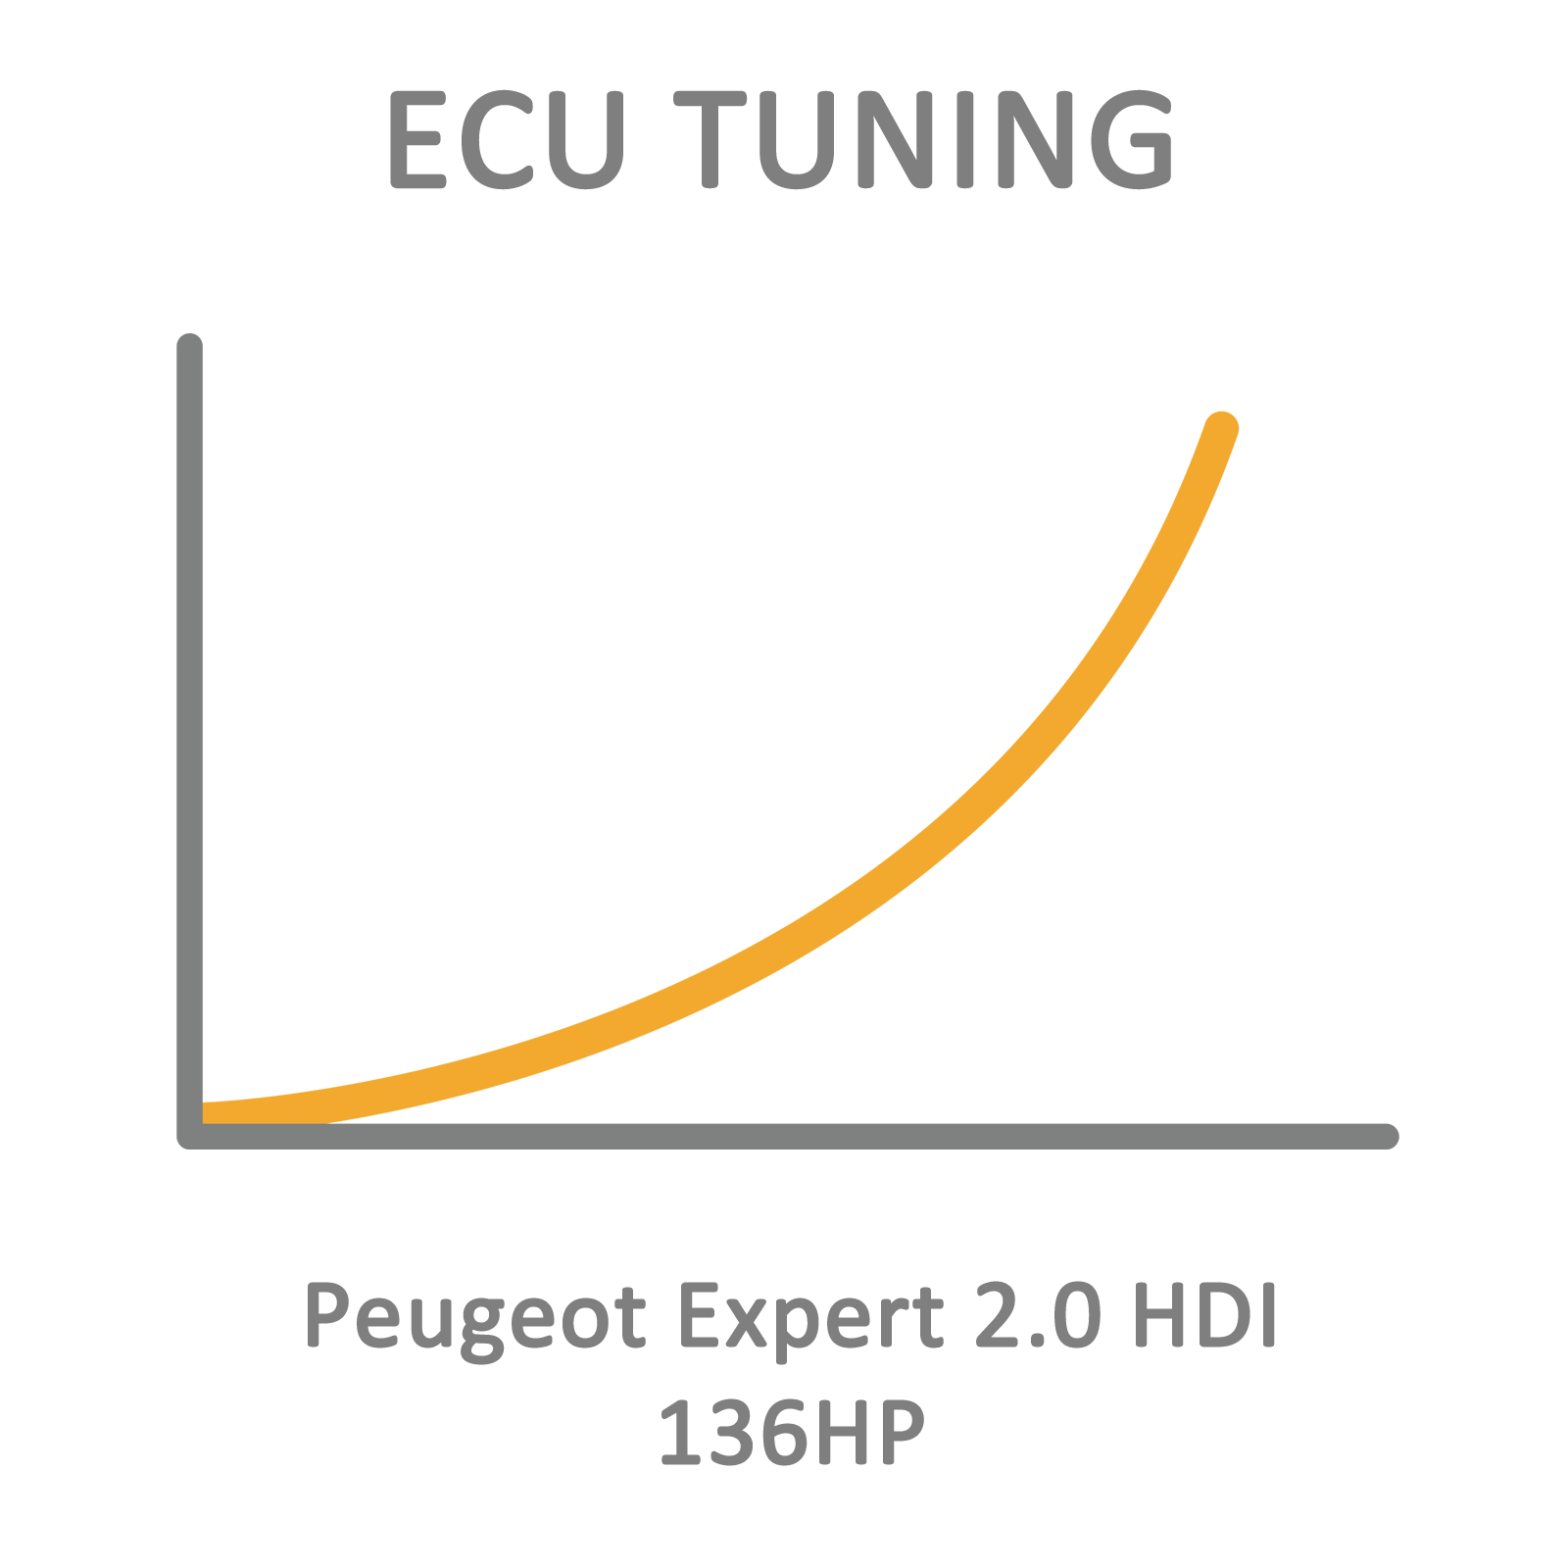 Peugeot Expert 2.0 HDI 136HP ECU Tuning Remapping Programming